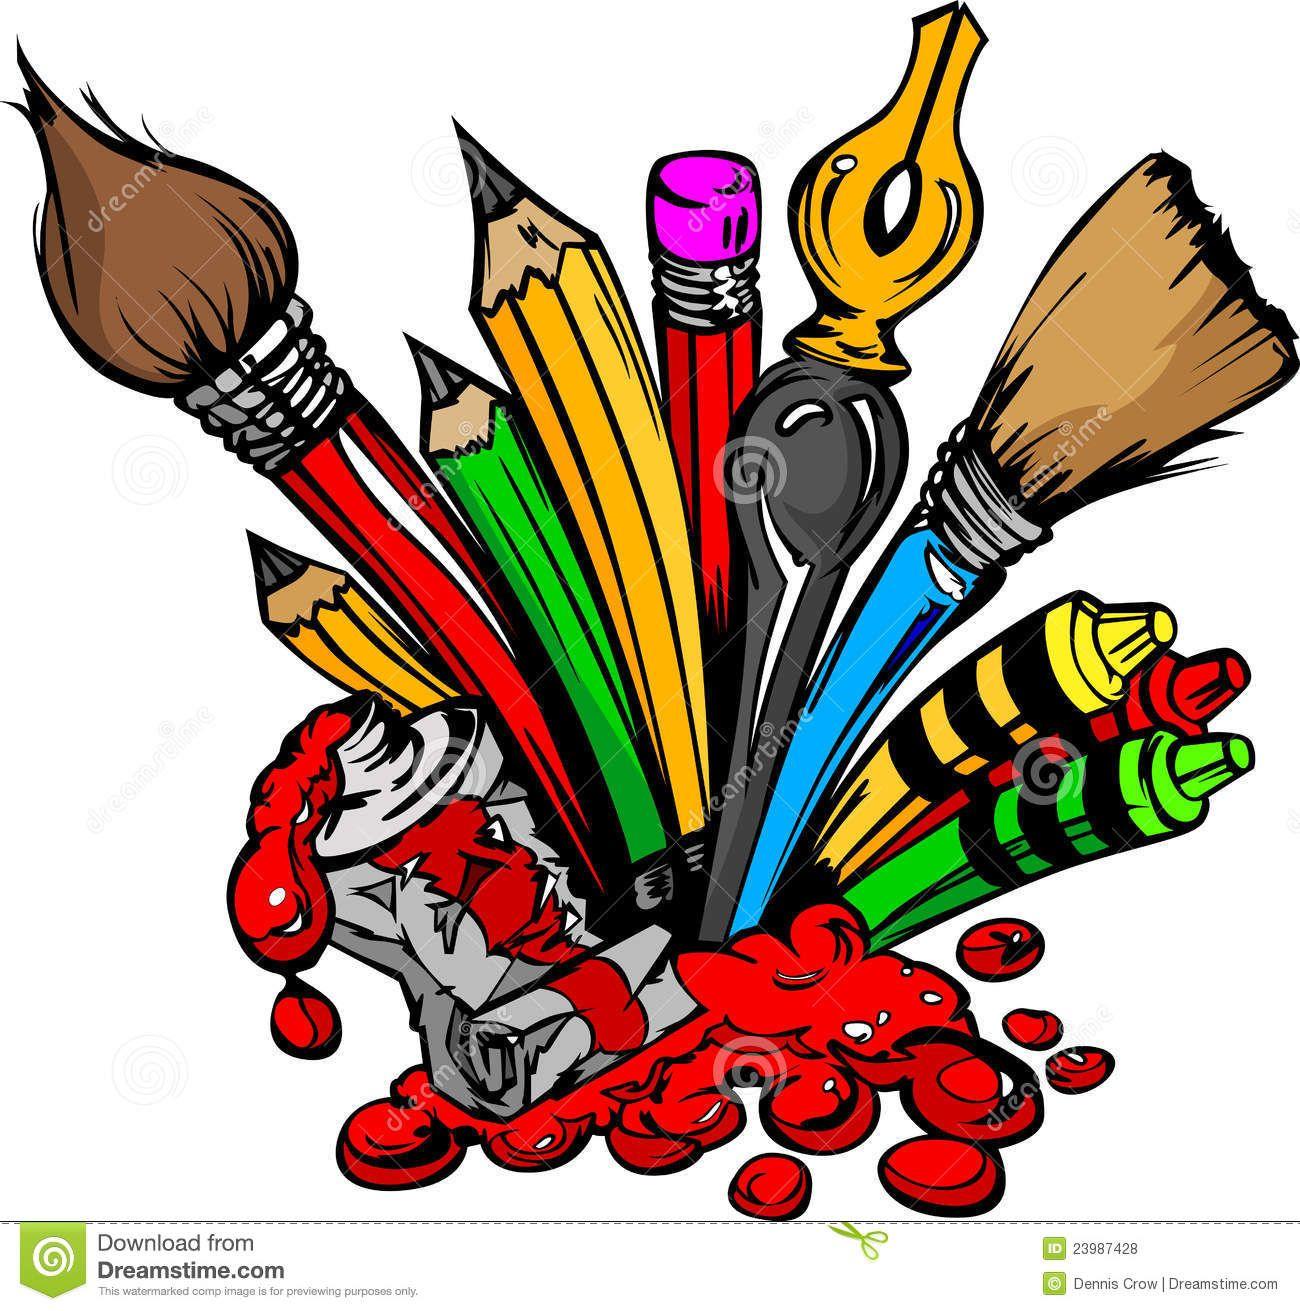 Art Supplies Images.